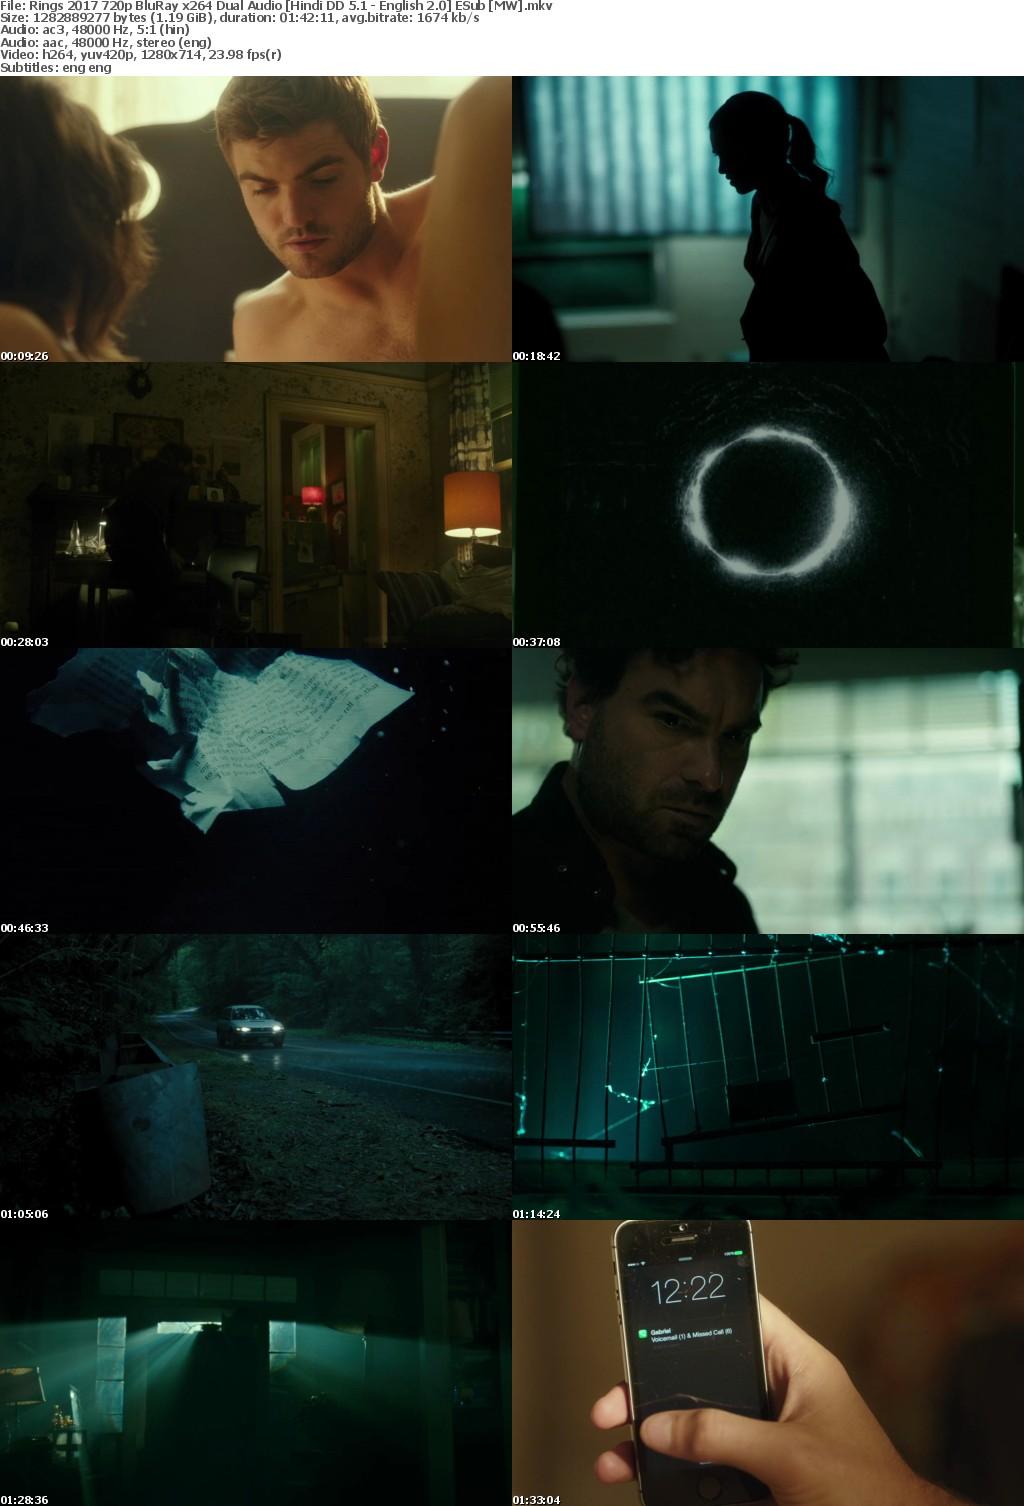 Rings (2017) 720p BluRay x264 Dual Audio Hindi DD 5.1 - English 2.0 ESub MW